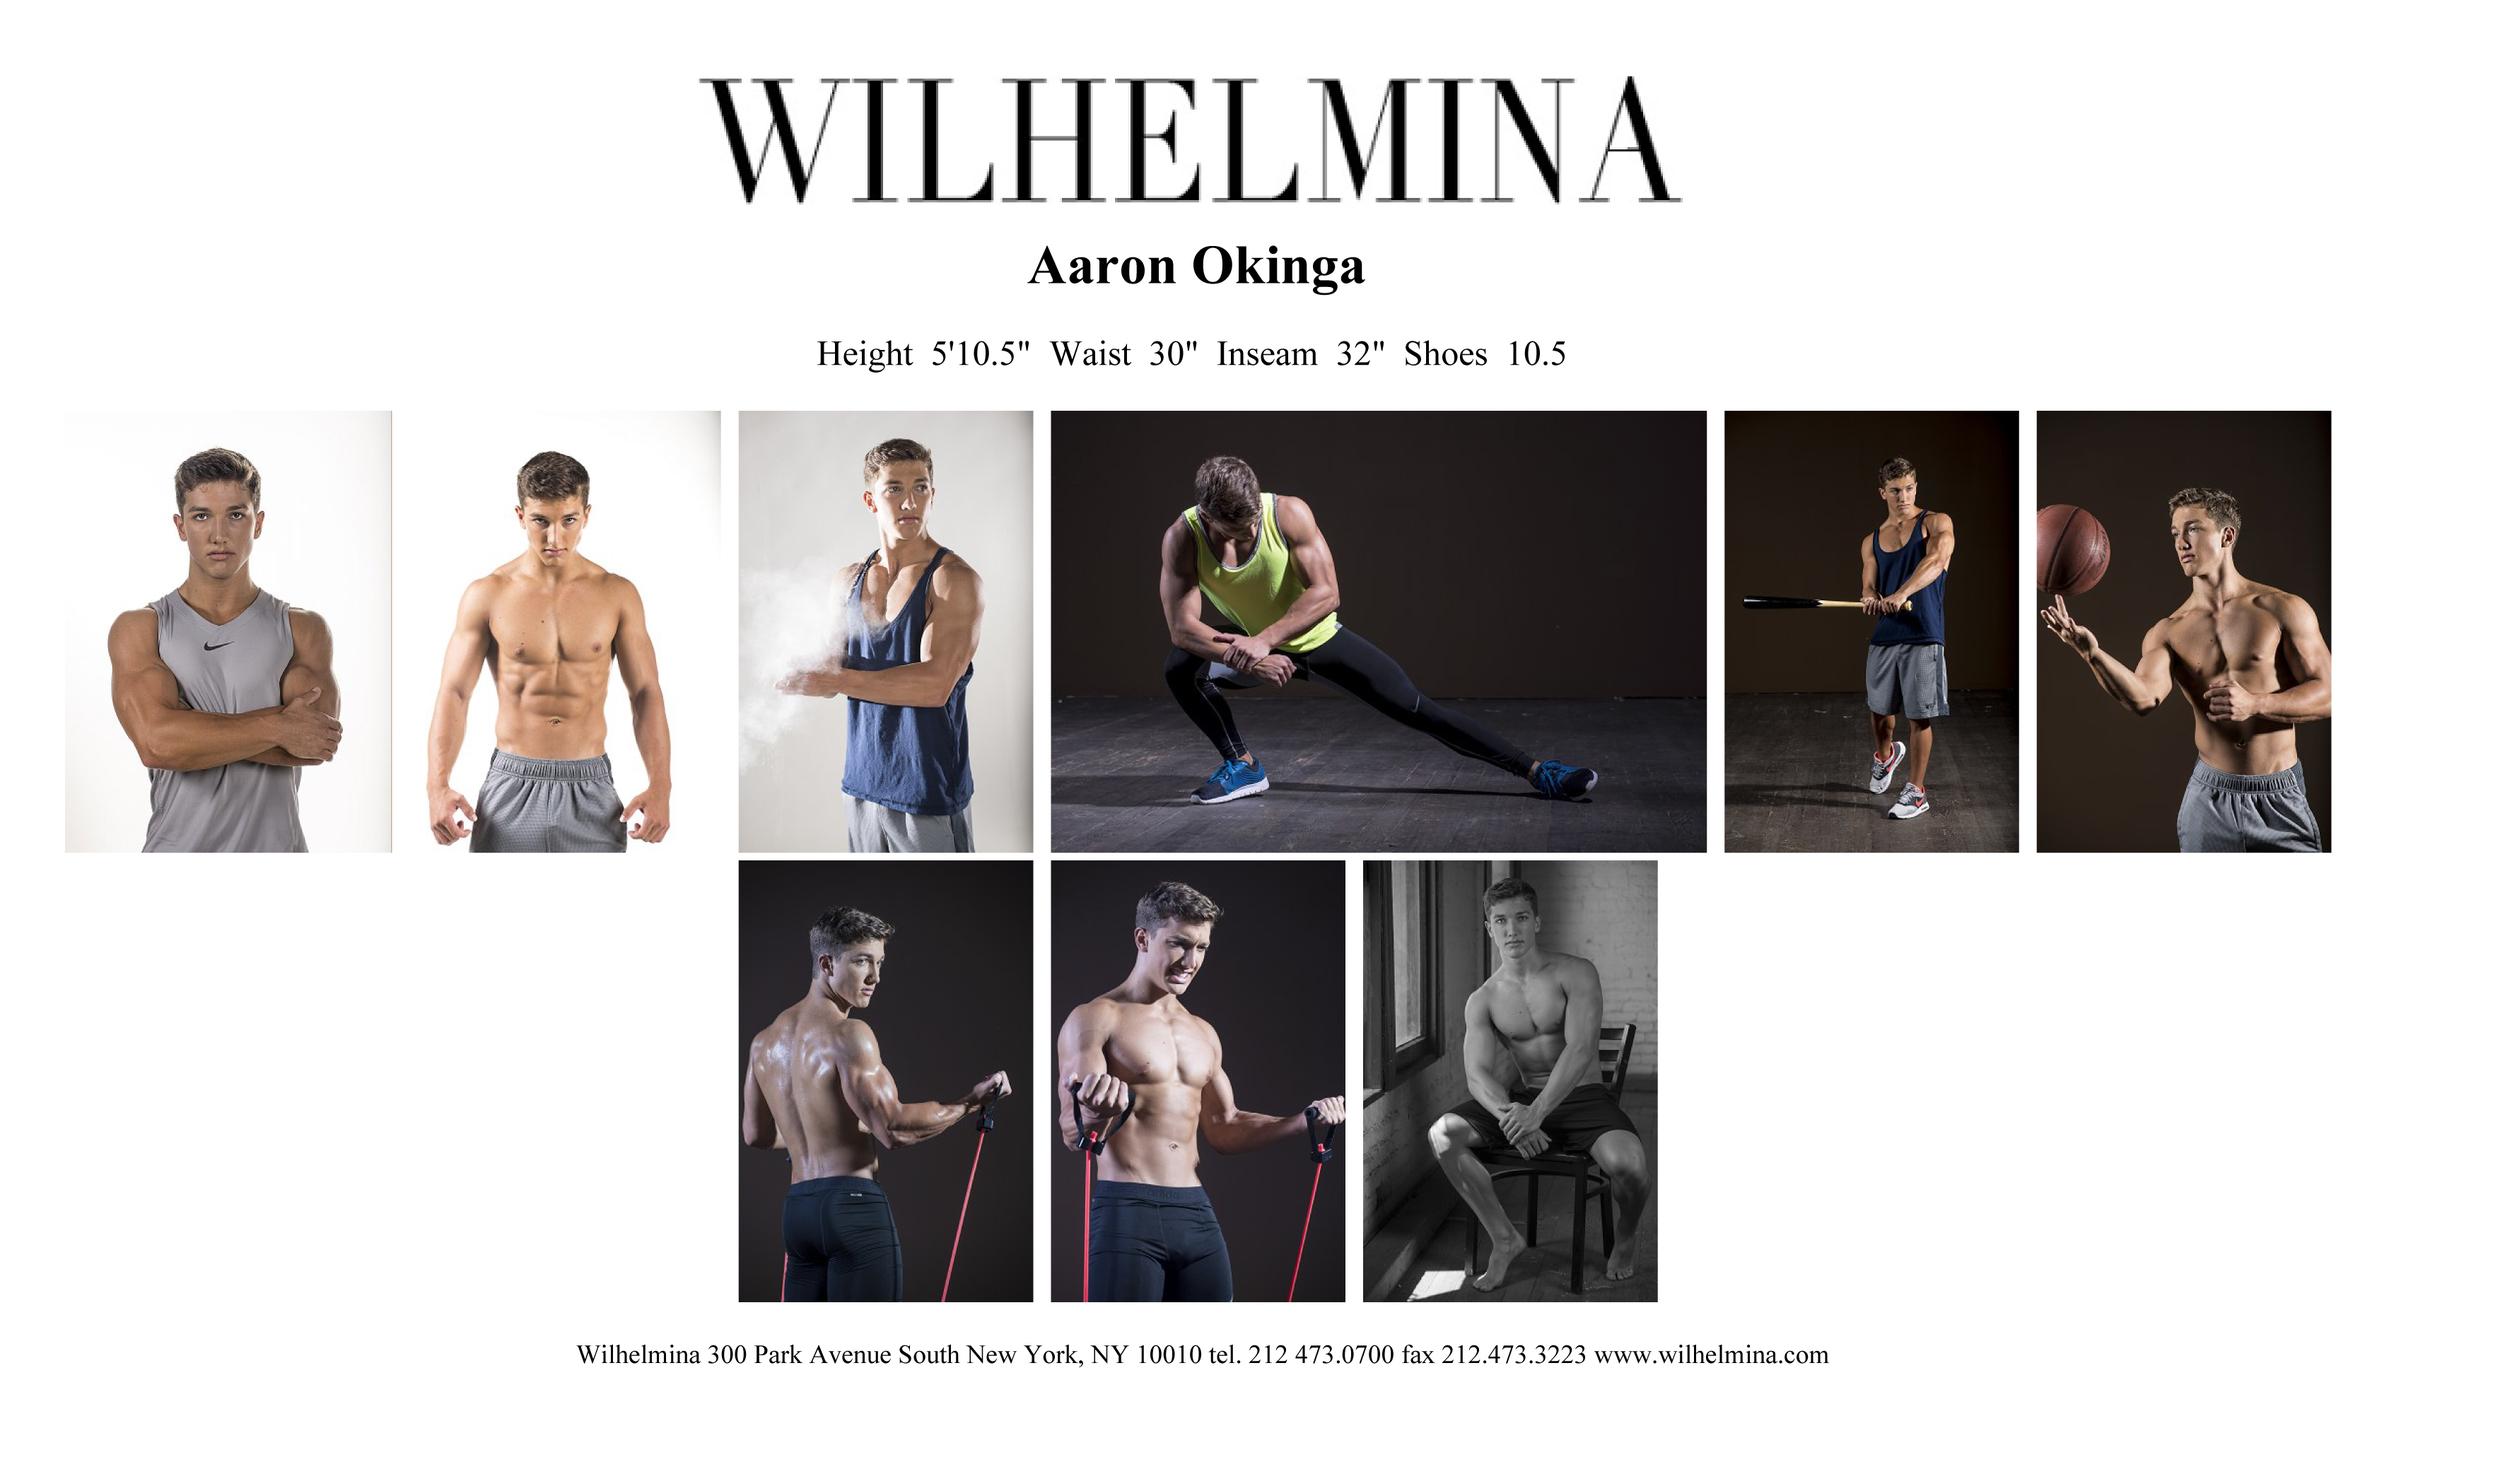 Wilhelmina Test Shoot